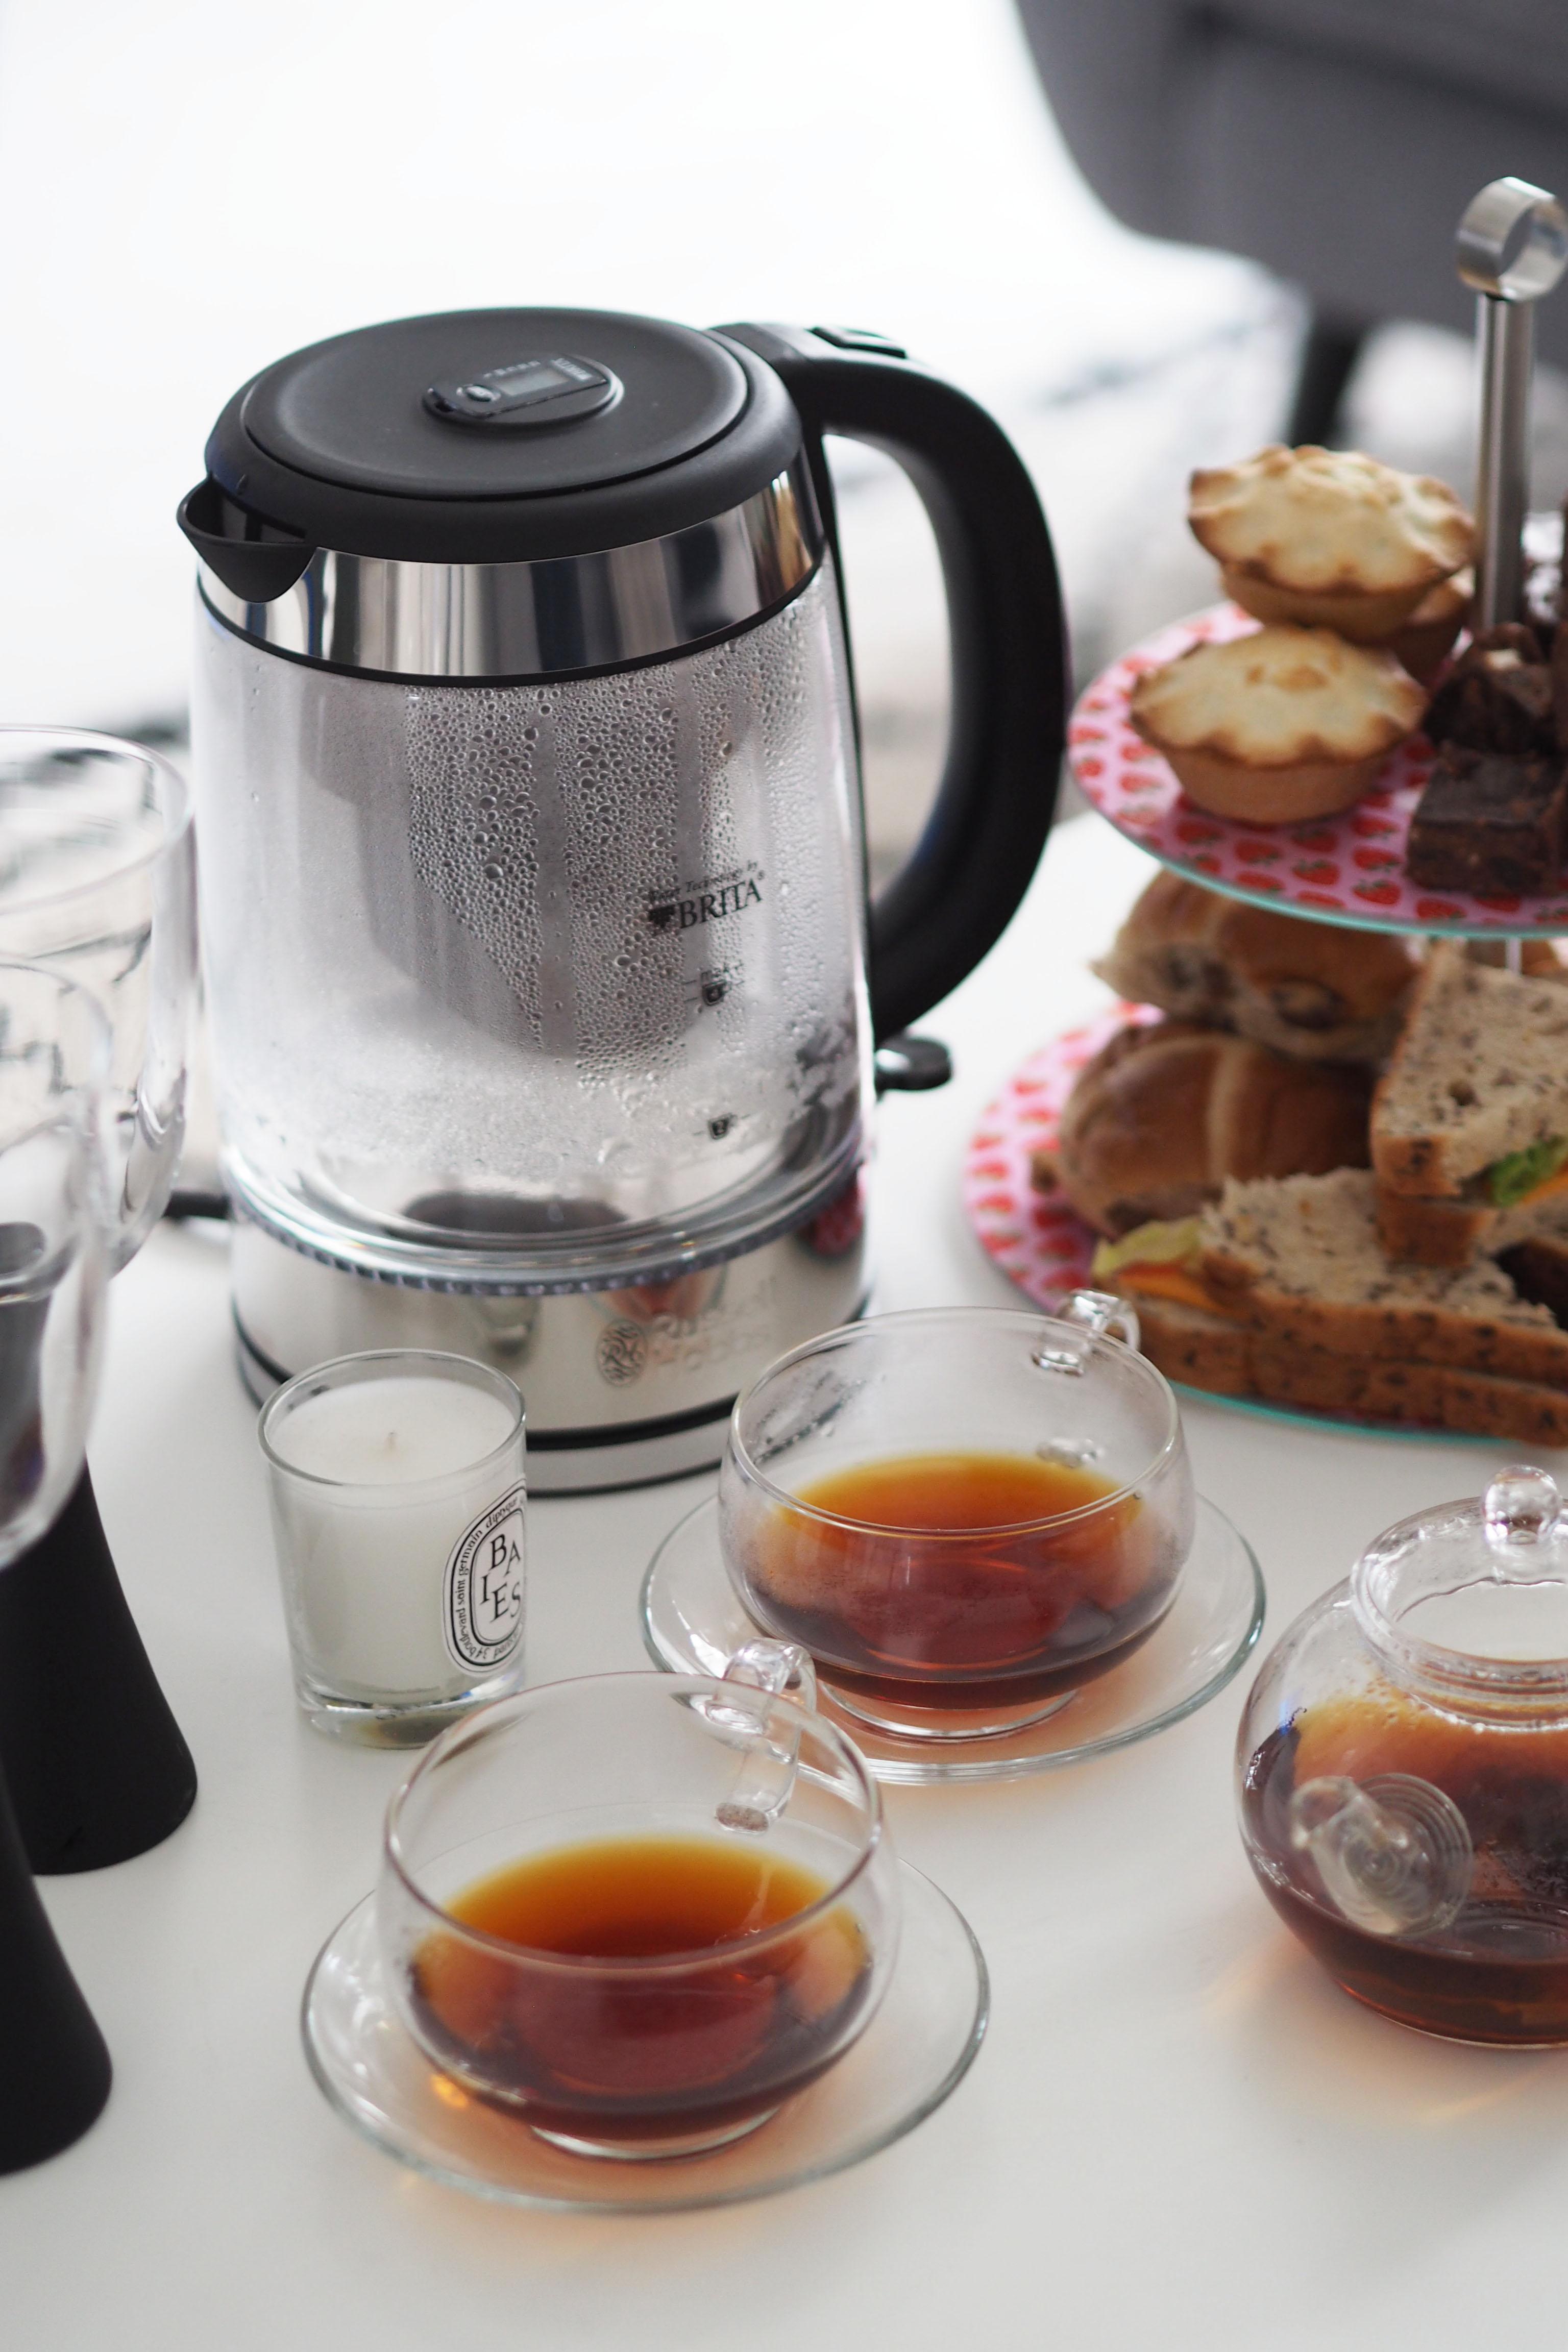 brita water kettle